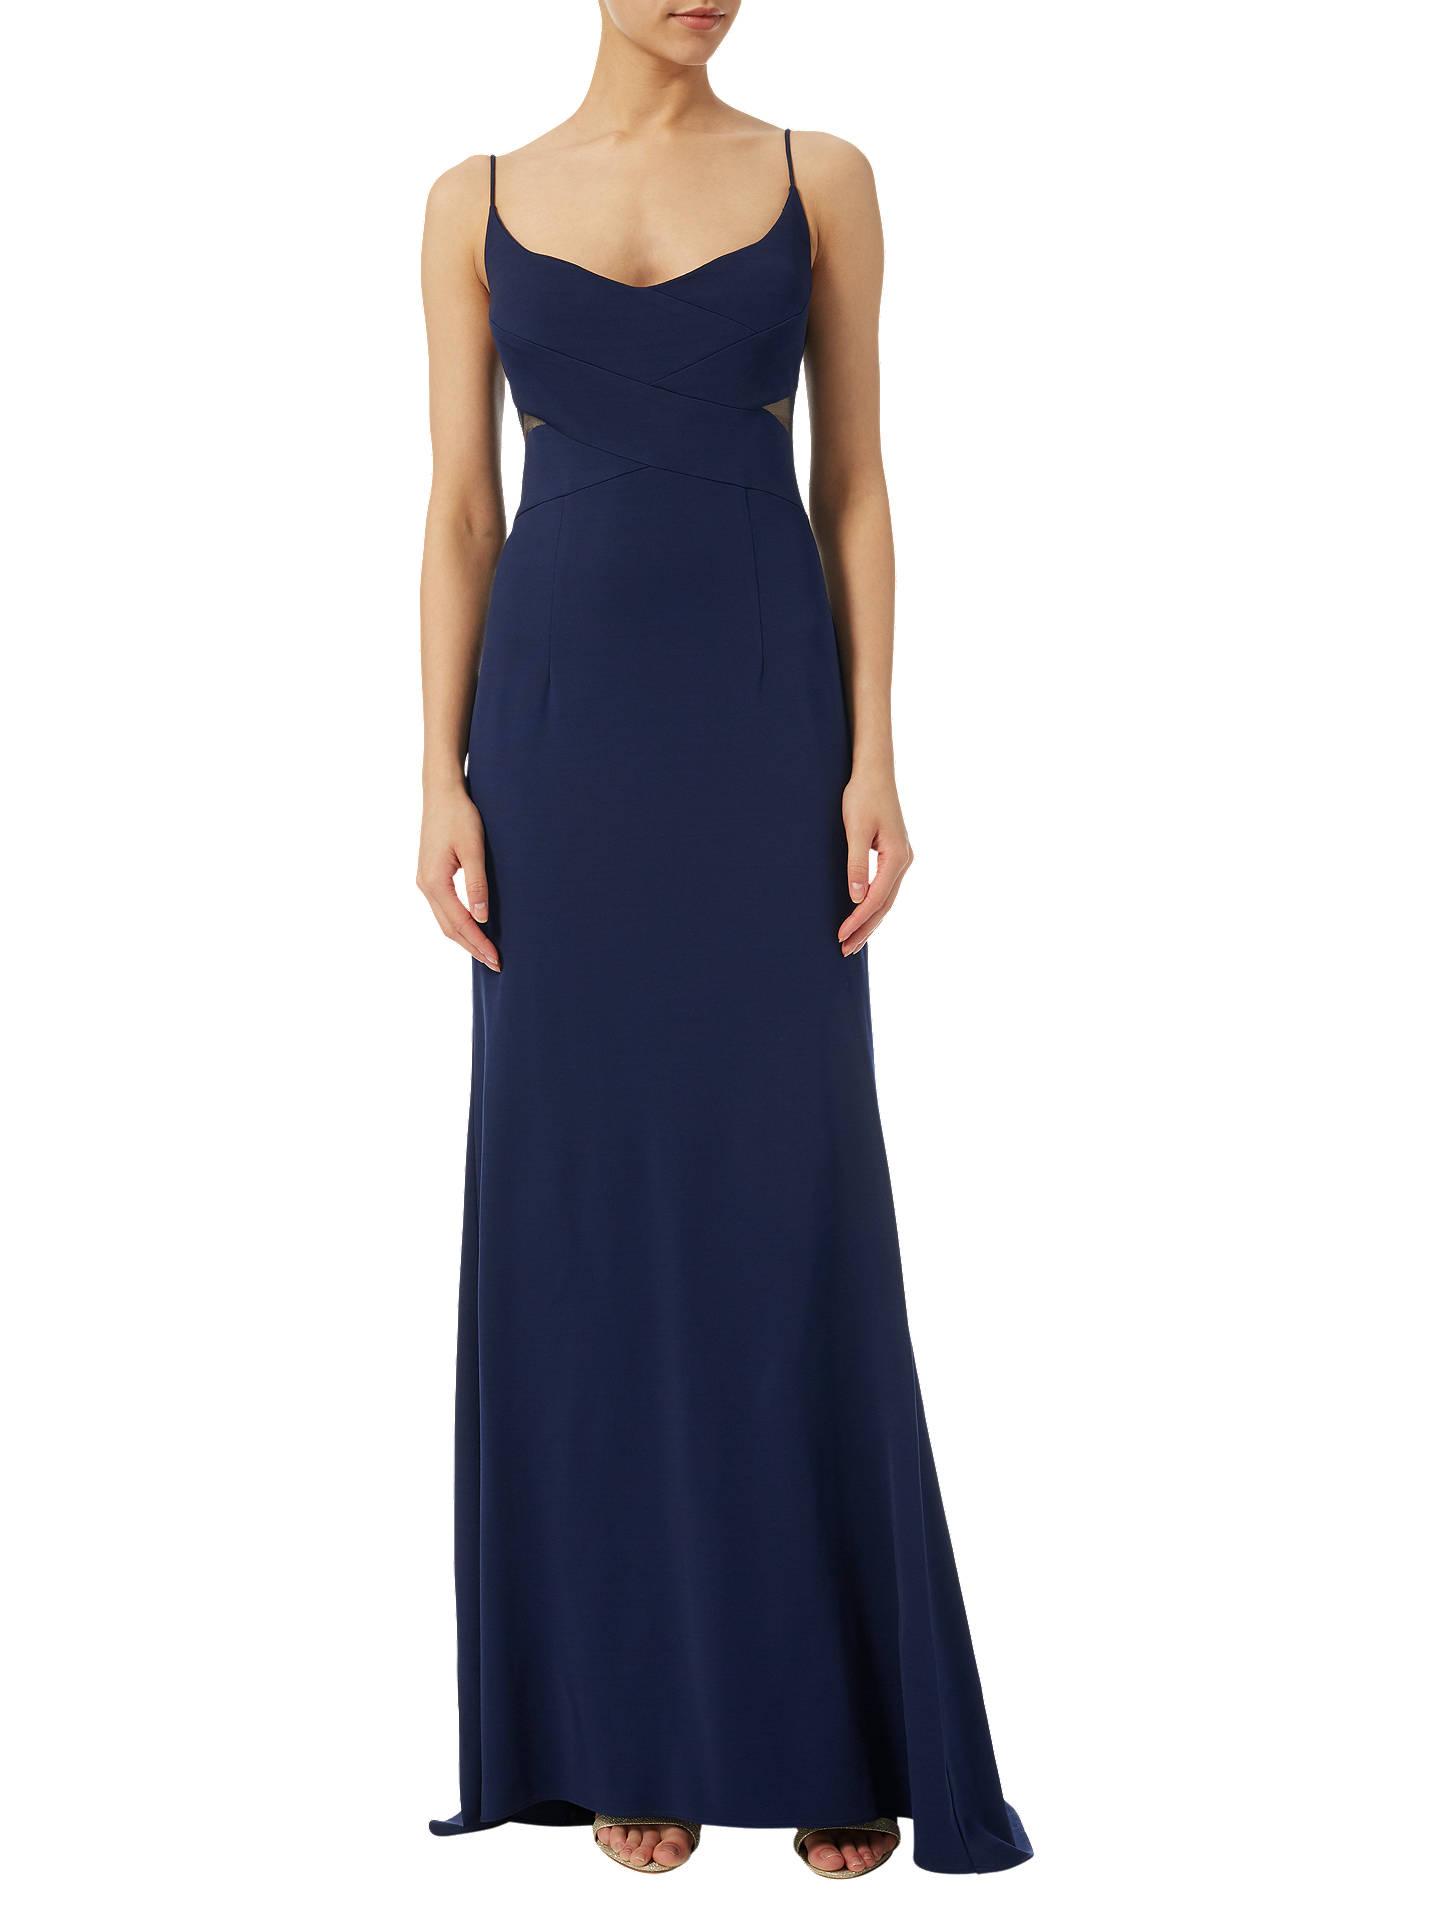 Adrianna Papell Sleeveless Mermaid Gown, Midnight Blue at John Lewis ...